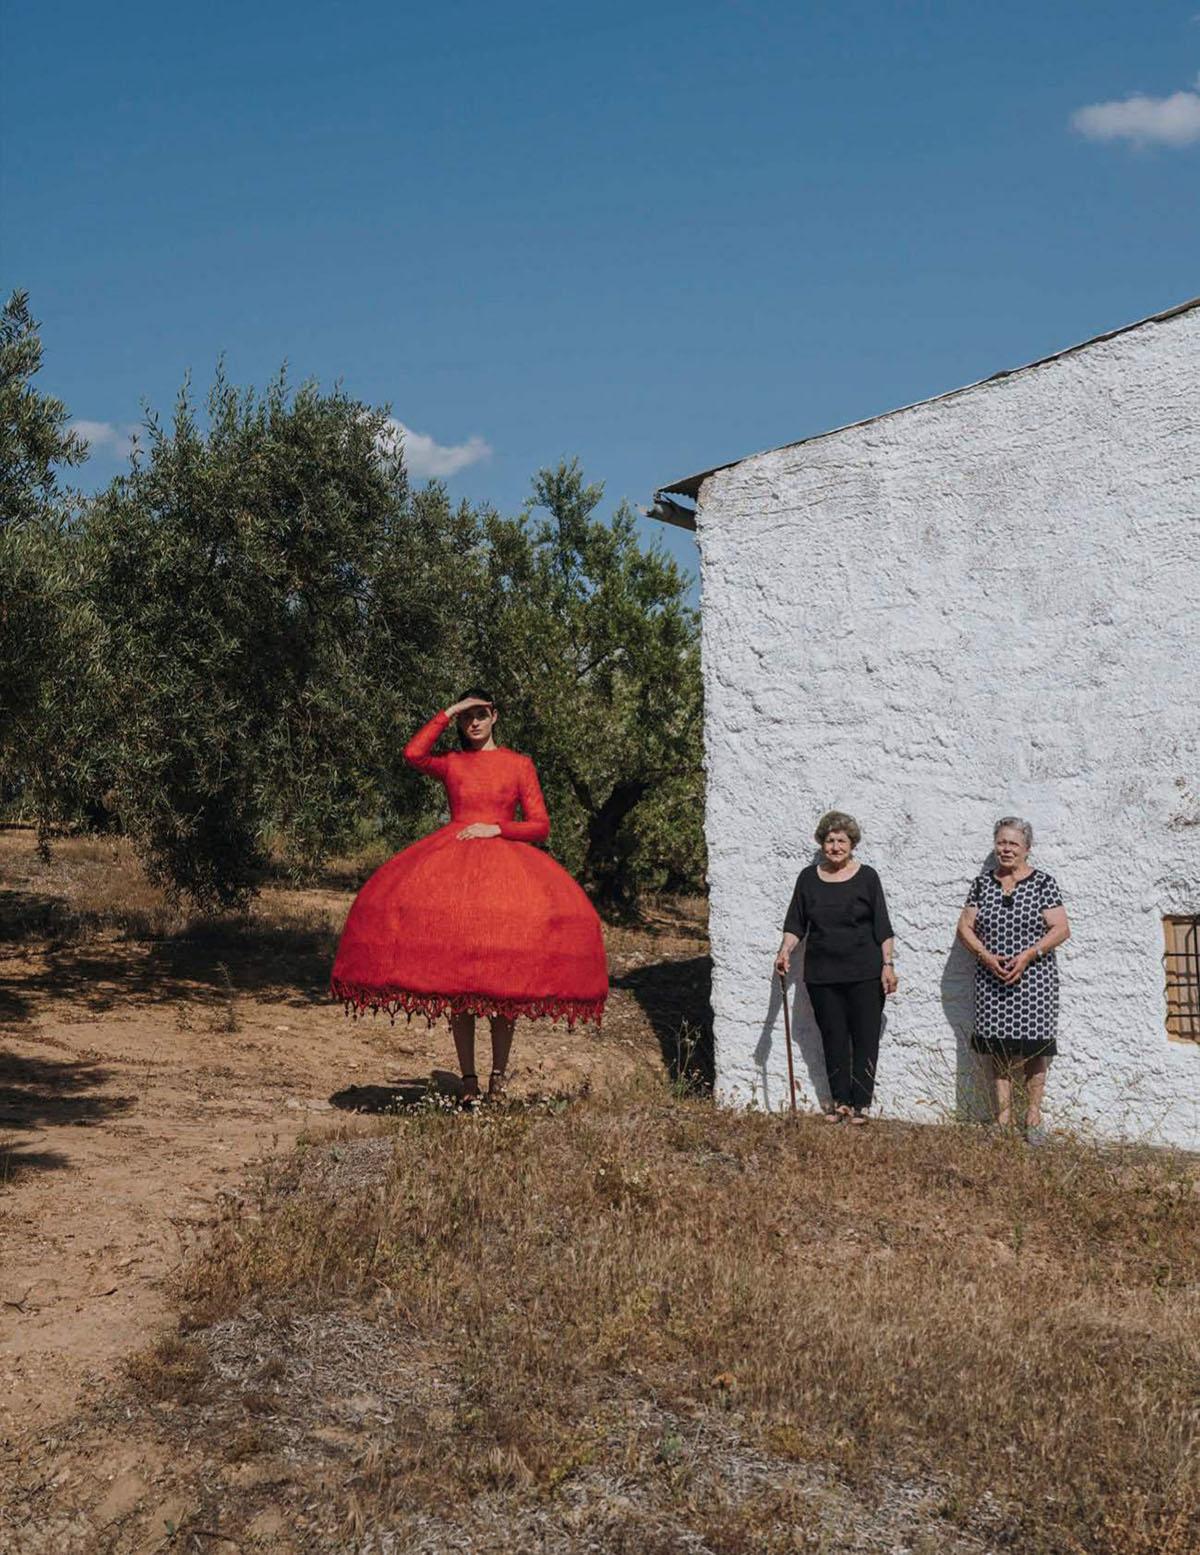 Africa Penalver by Yosigo for Vogue Spain July 2021